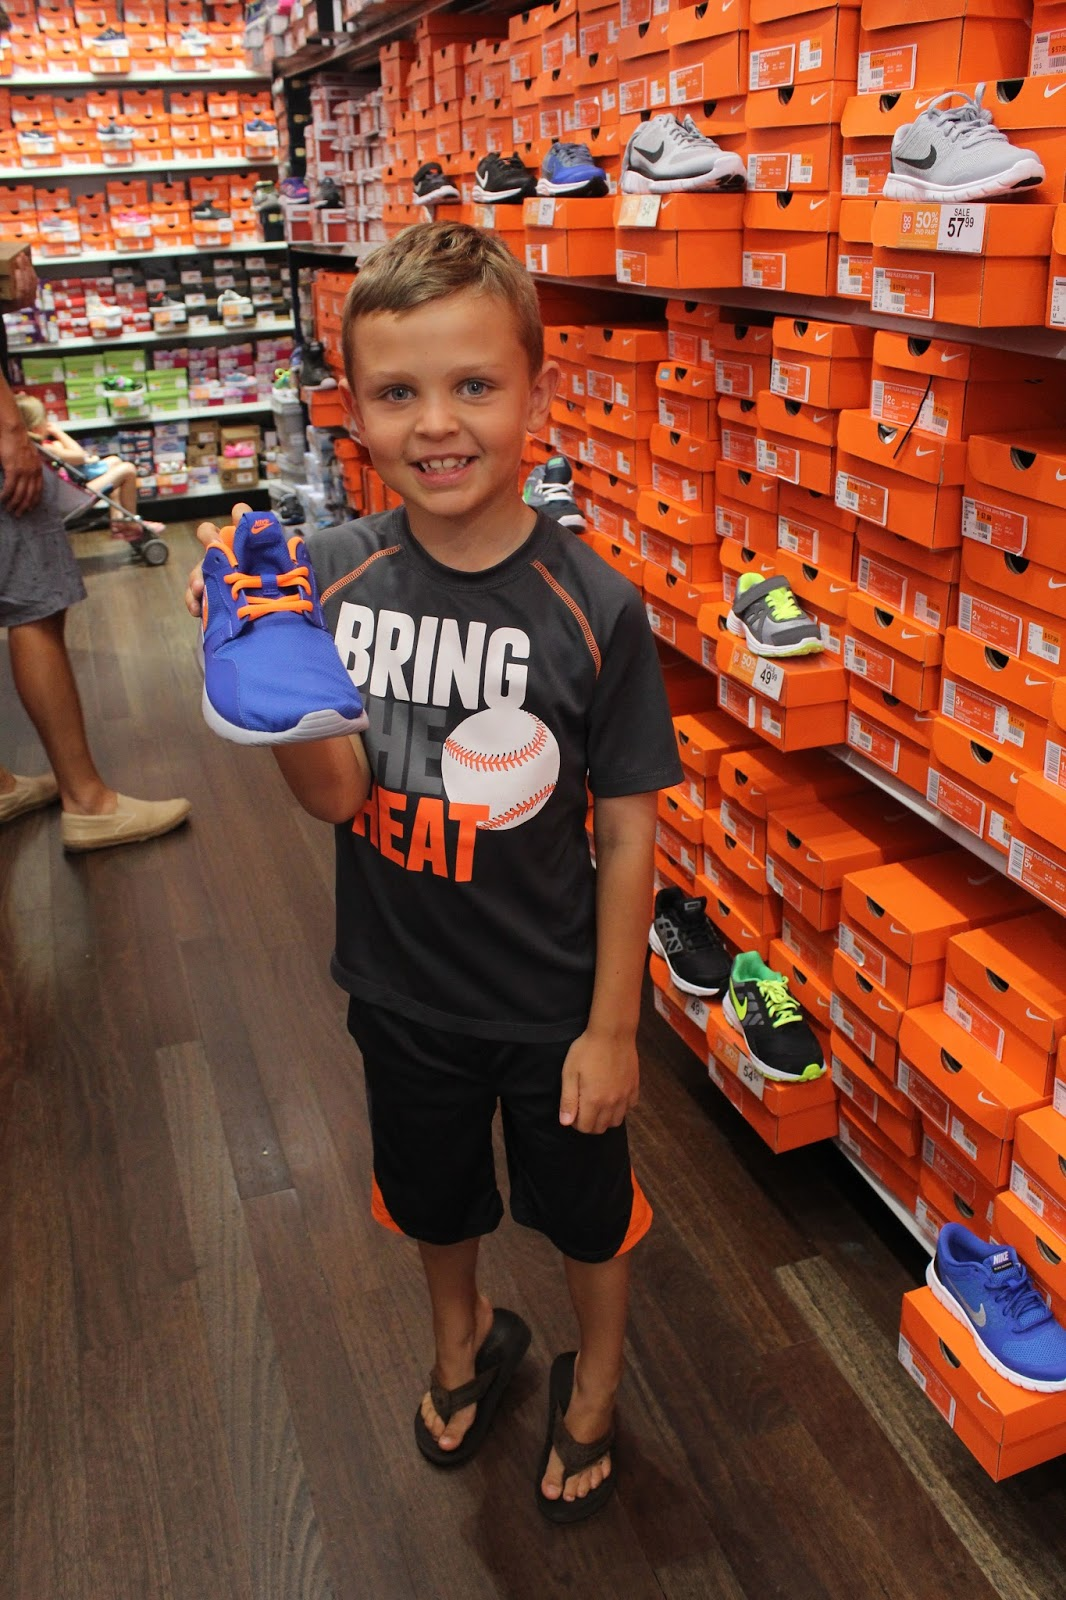 NY Mets Nike Rack Room Shoes